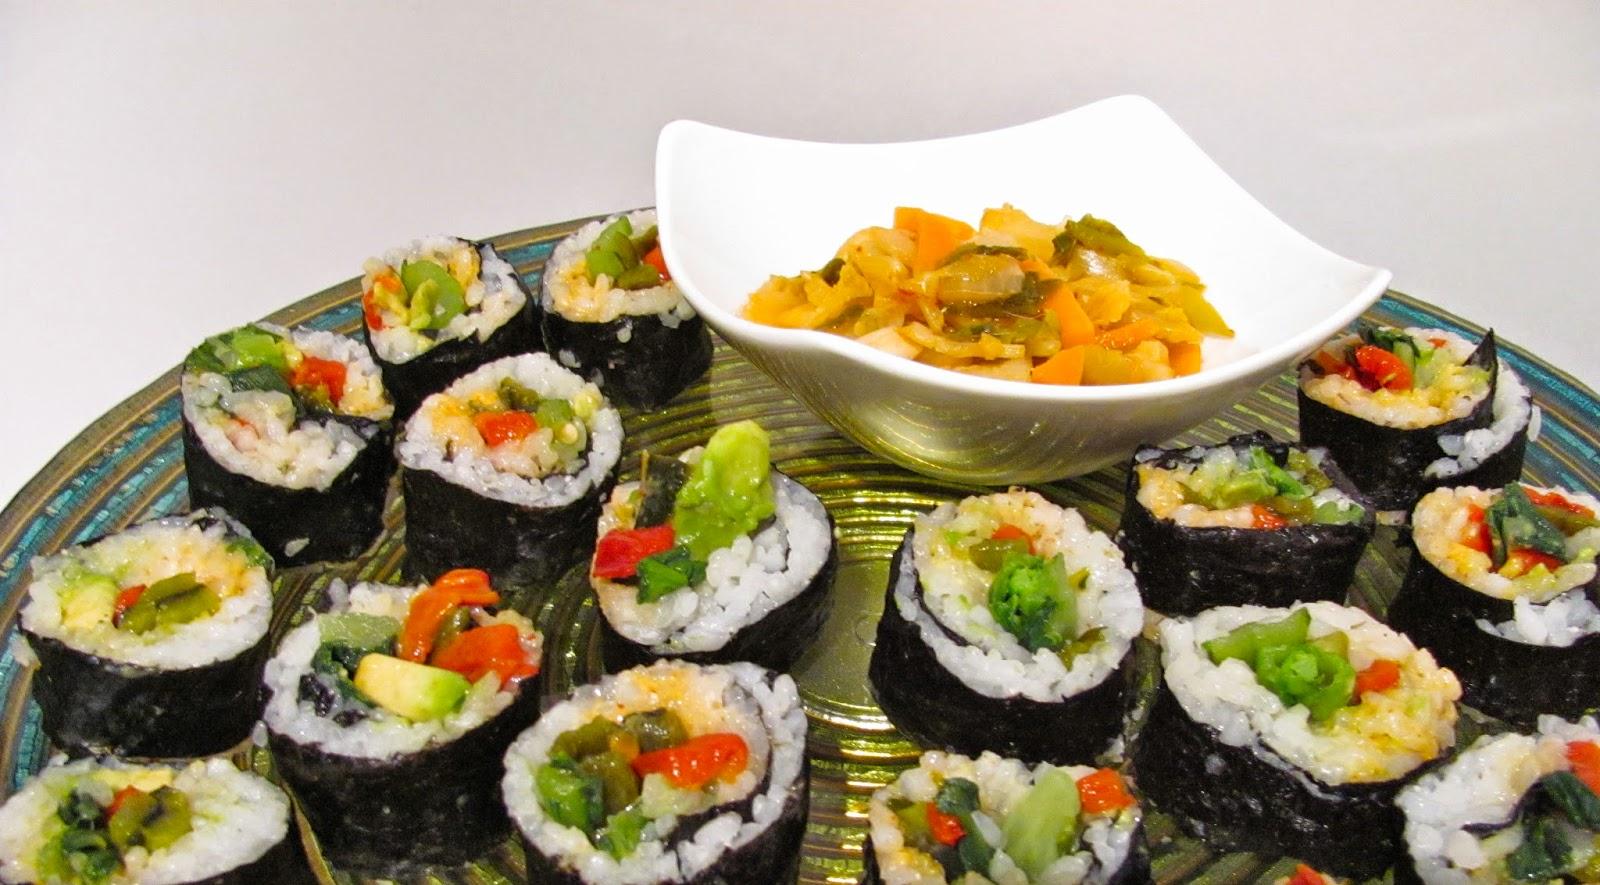 Spicy Avocado Roll | Vegan Sushi Platter